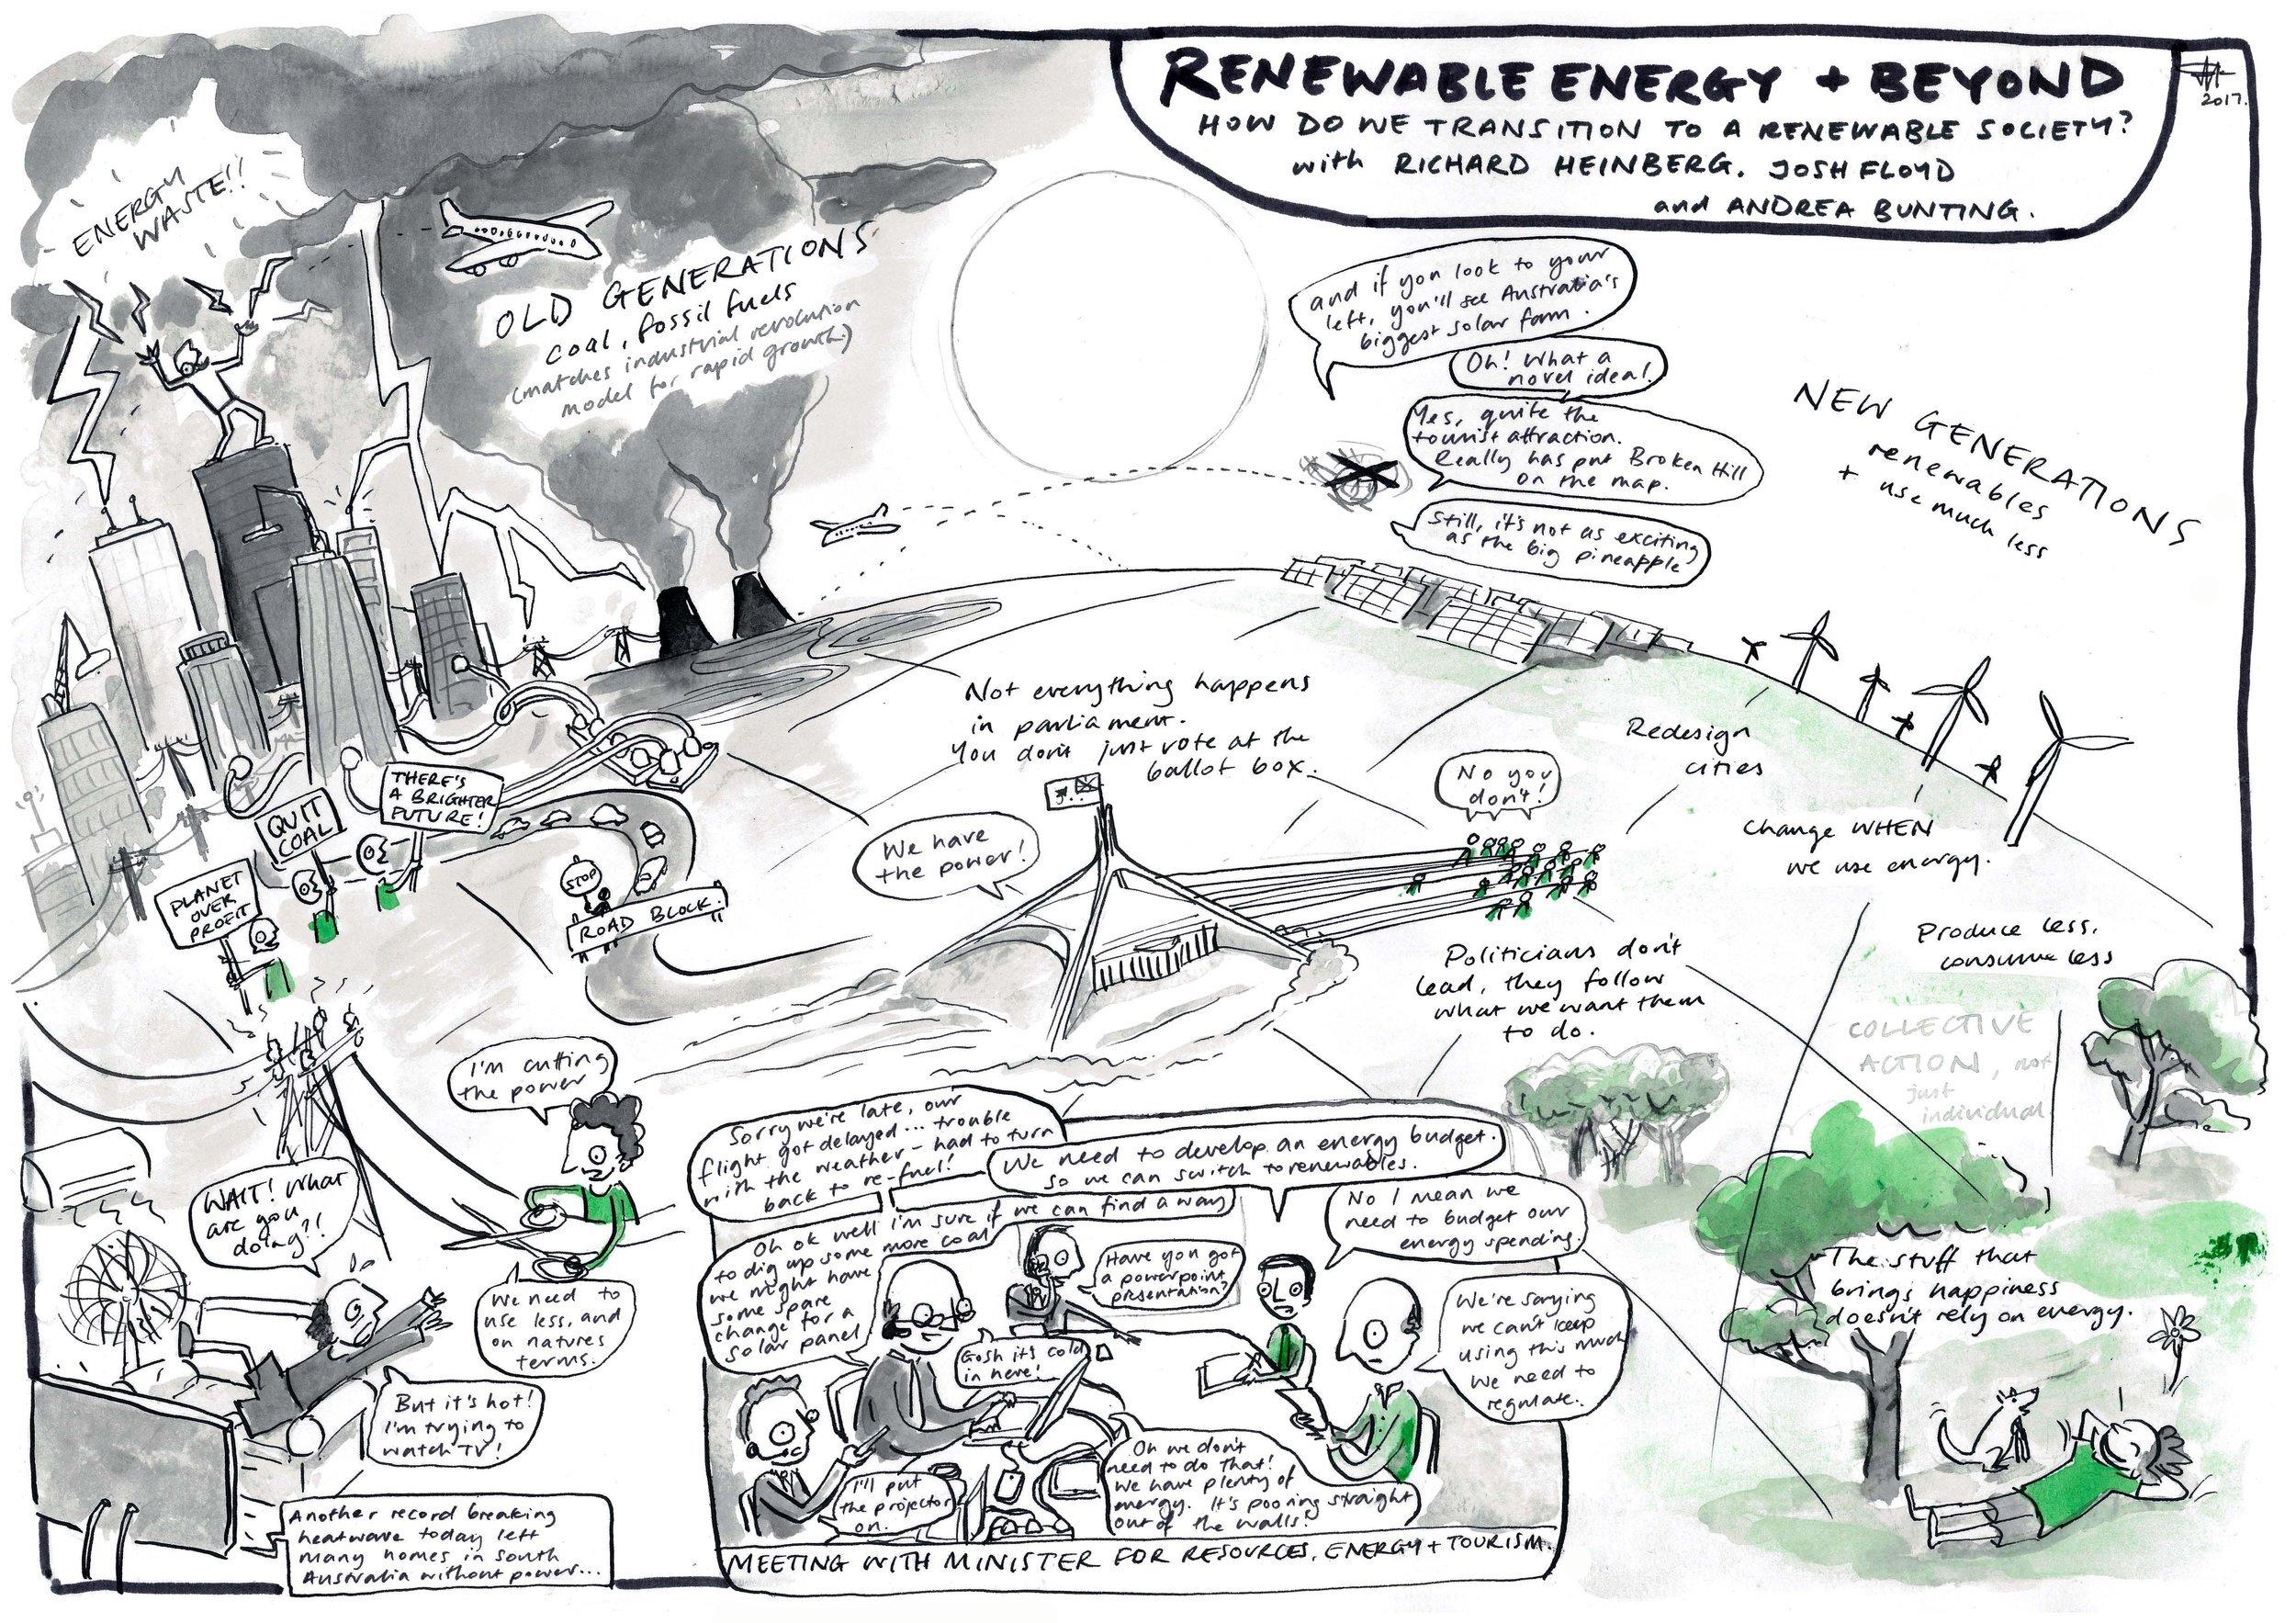 RenewableEnergyandBeyondcopy.jpg